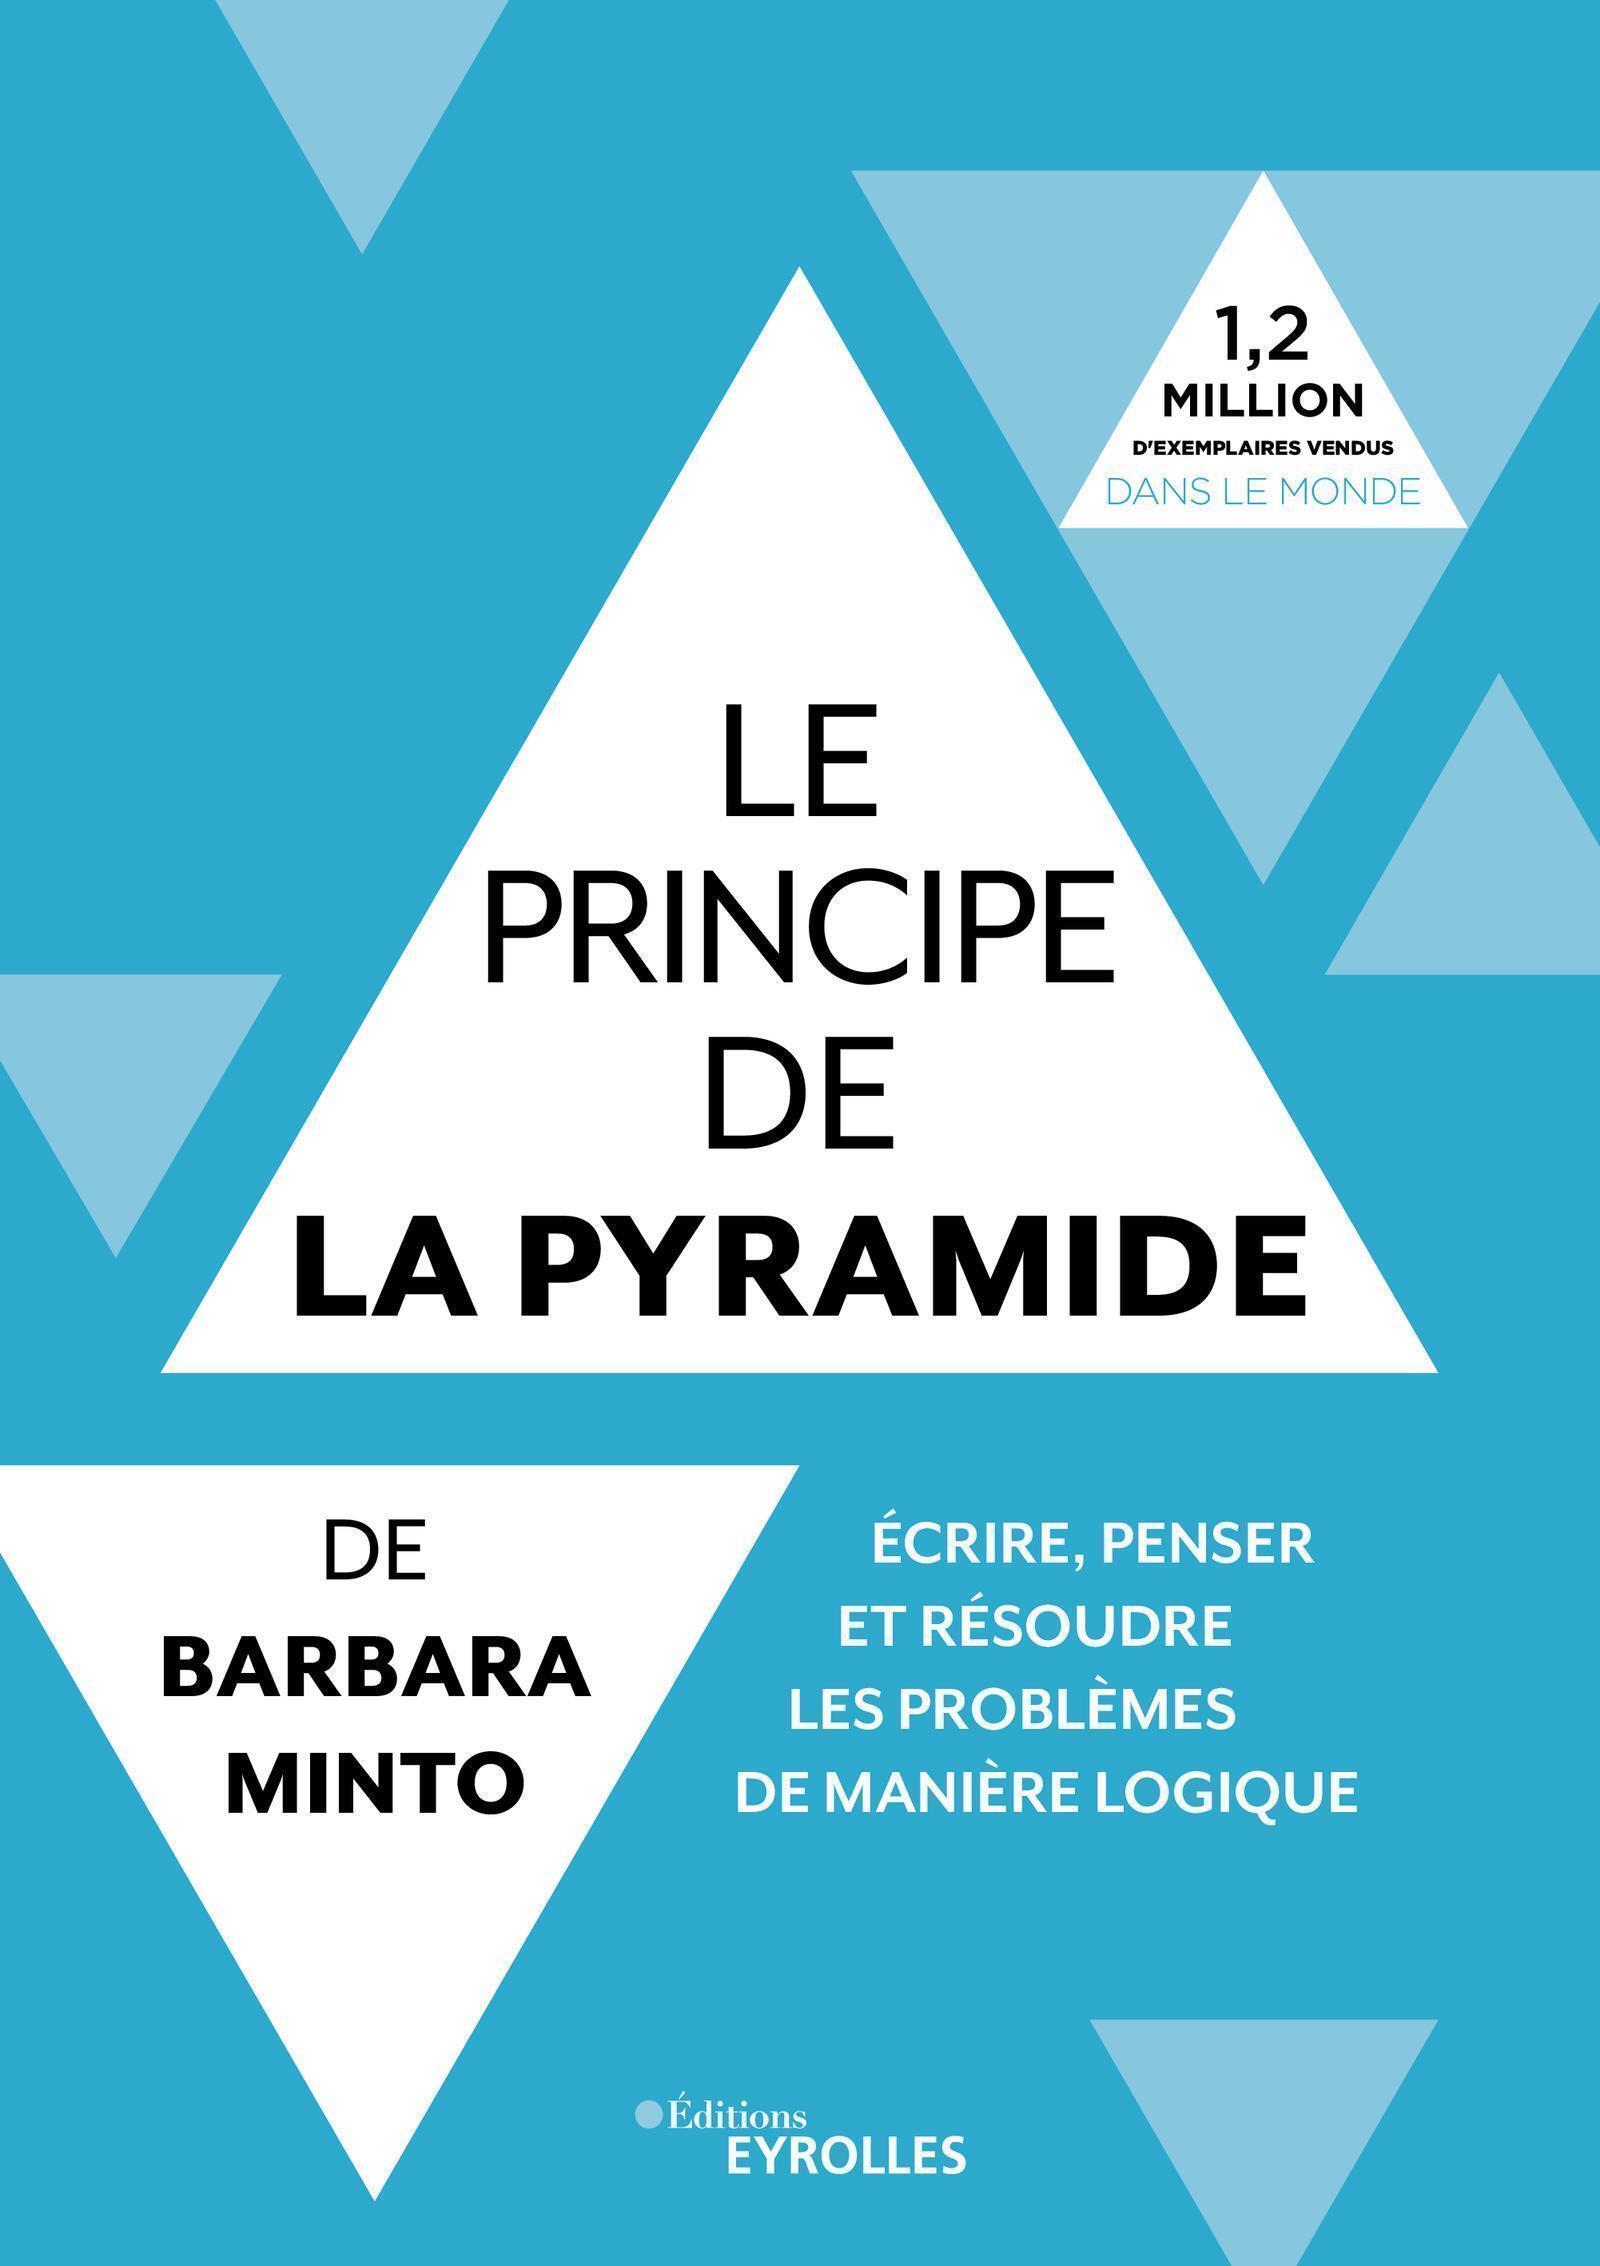 LE PRINCIPE DE LA PYRAMIDE DE BARBARA MINTO : ECRIRE, PENSER ET RESOUDRE LES PRO